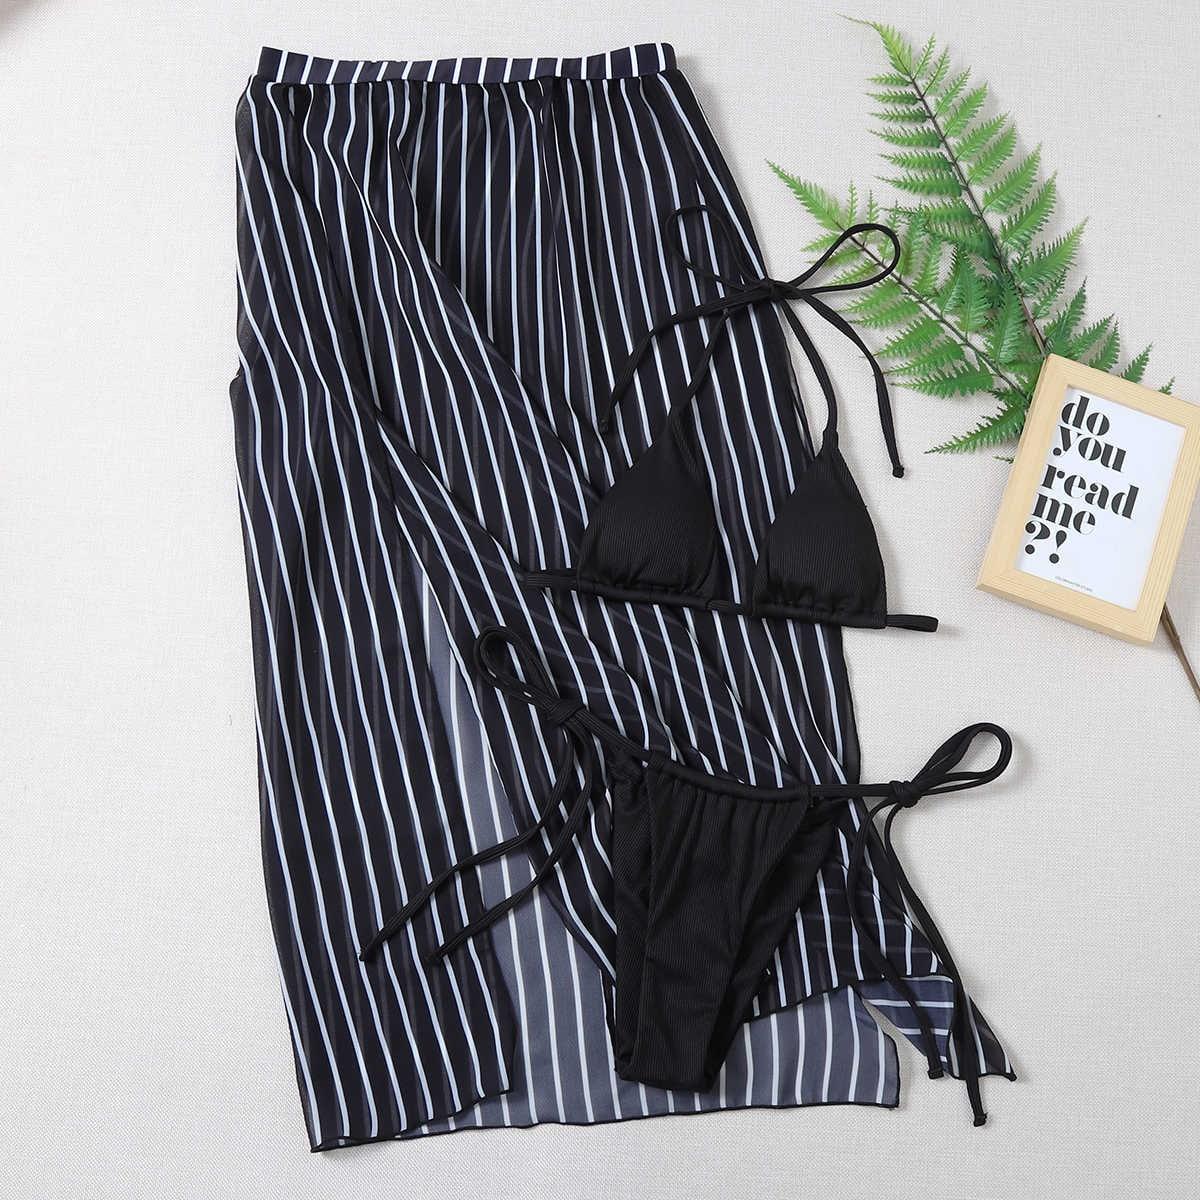 SHEIN / 3pack Triangle Thong Bikini Swimsuit & Striped Beach Skirt